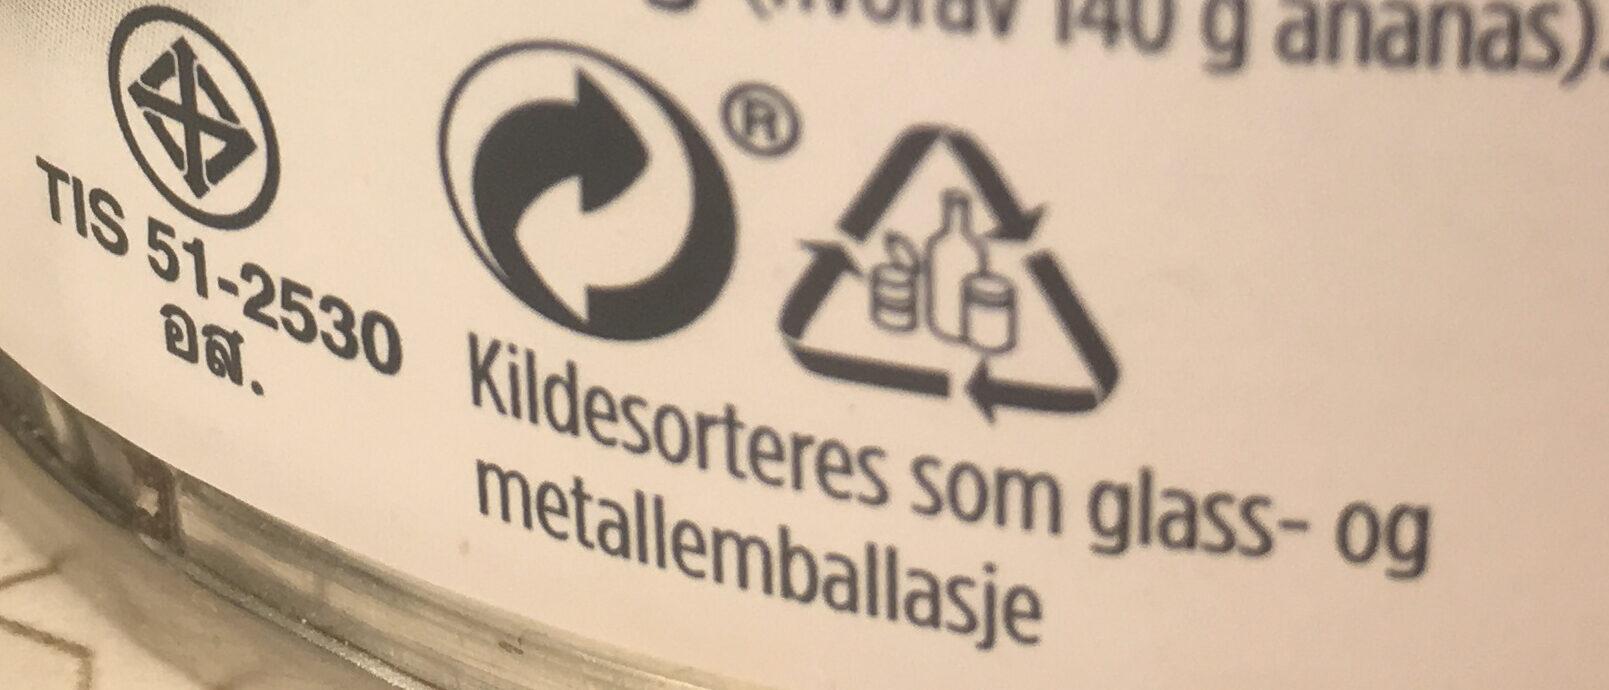 Ananas Biter i Juice - Instruction de recyclage et/ou informations d'emballage - nb